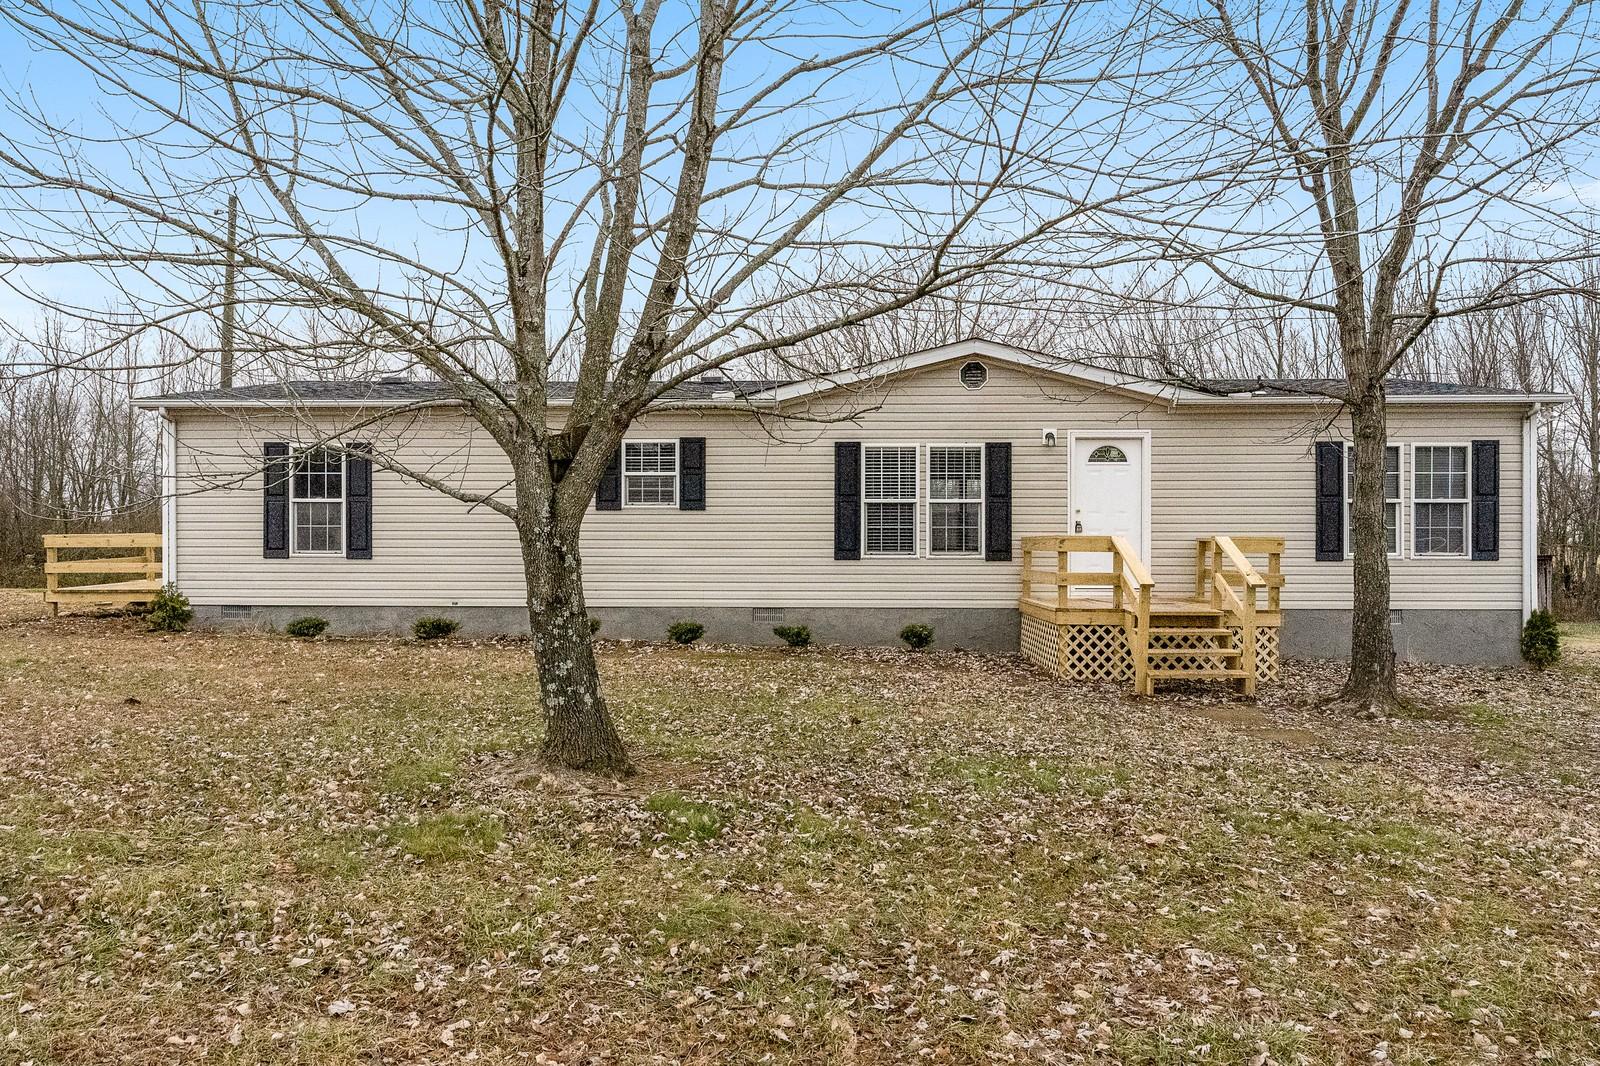 4966 HWY 431N, Springfield, TN 37172 - Springfield, TN real estate listing